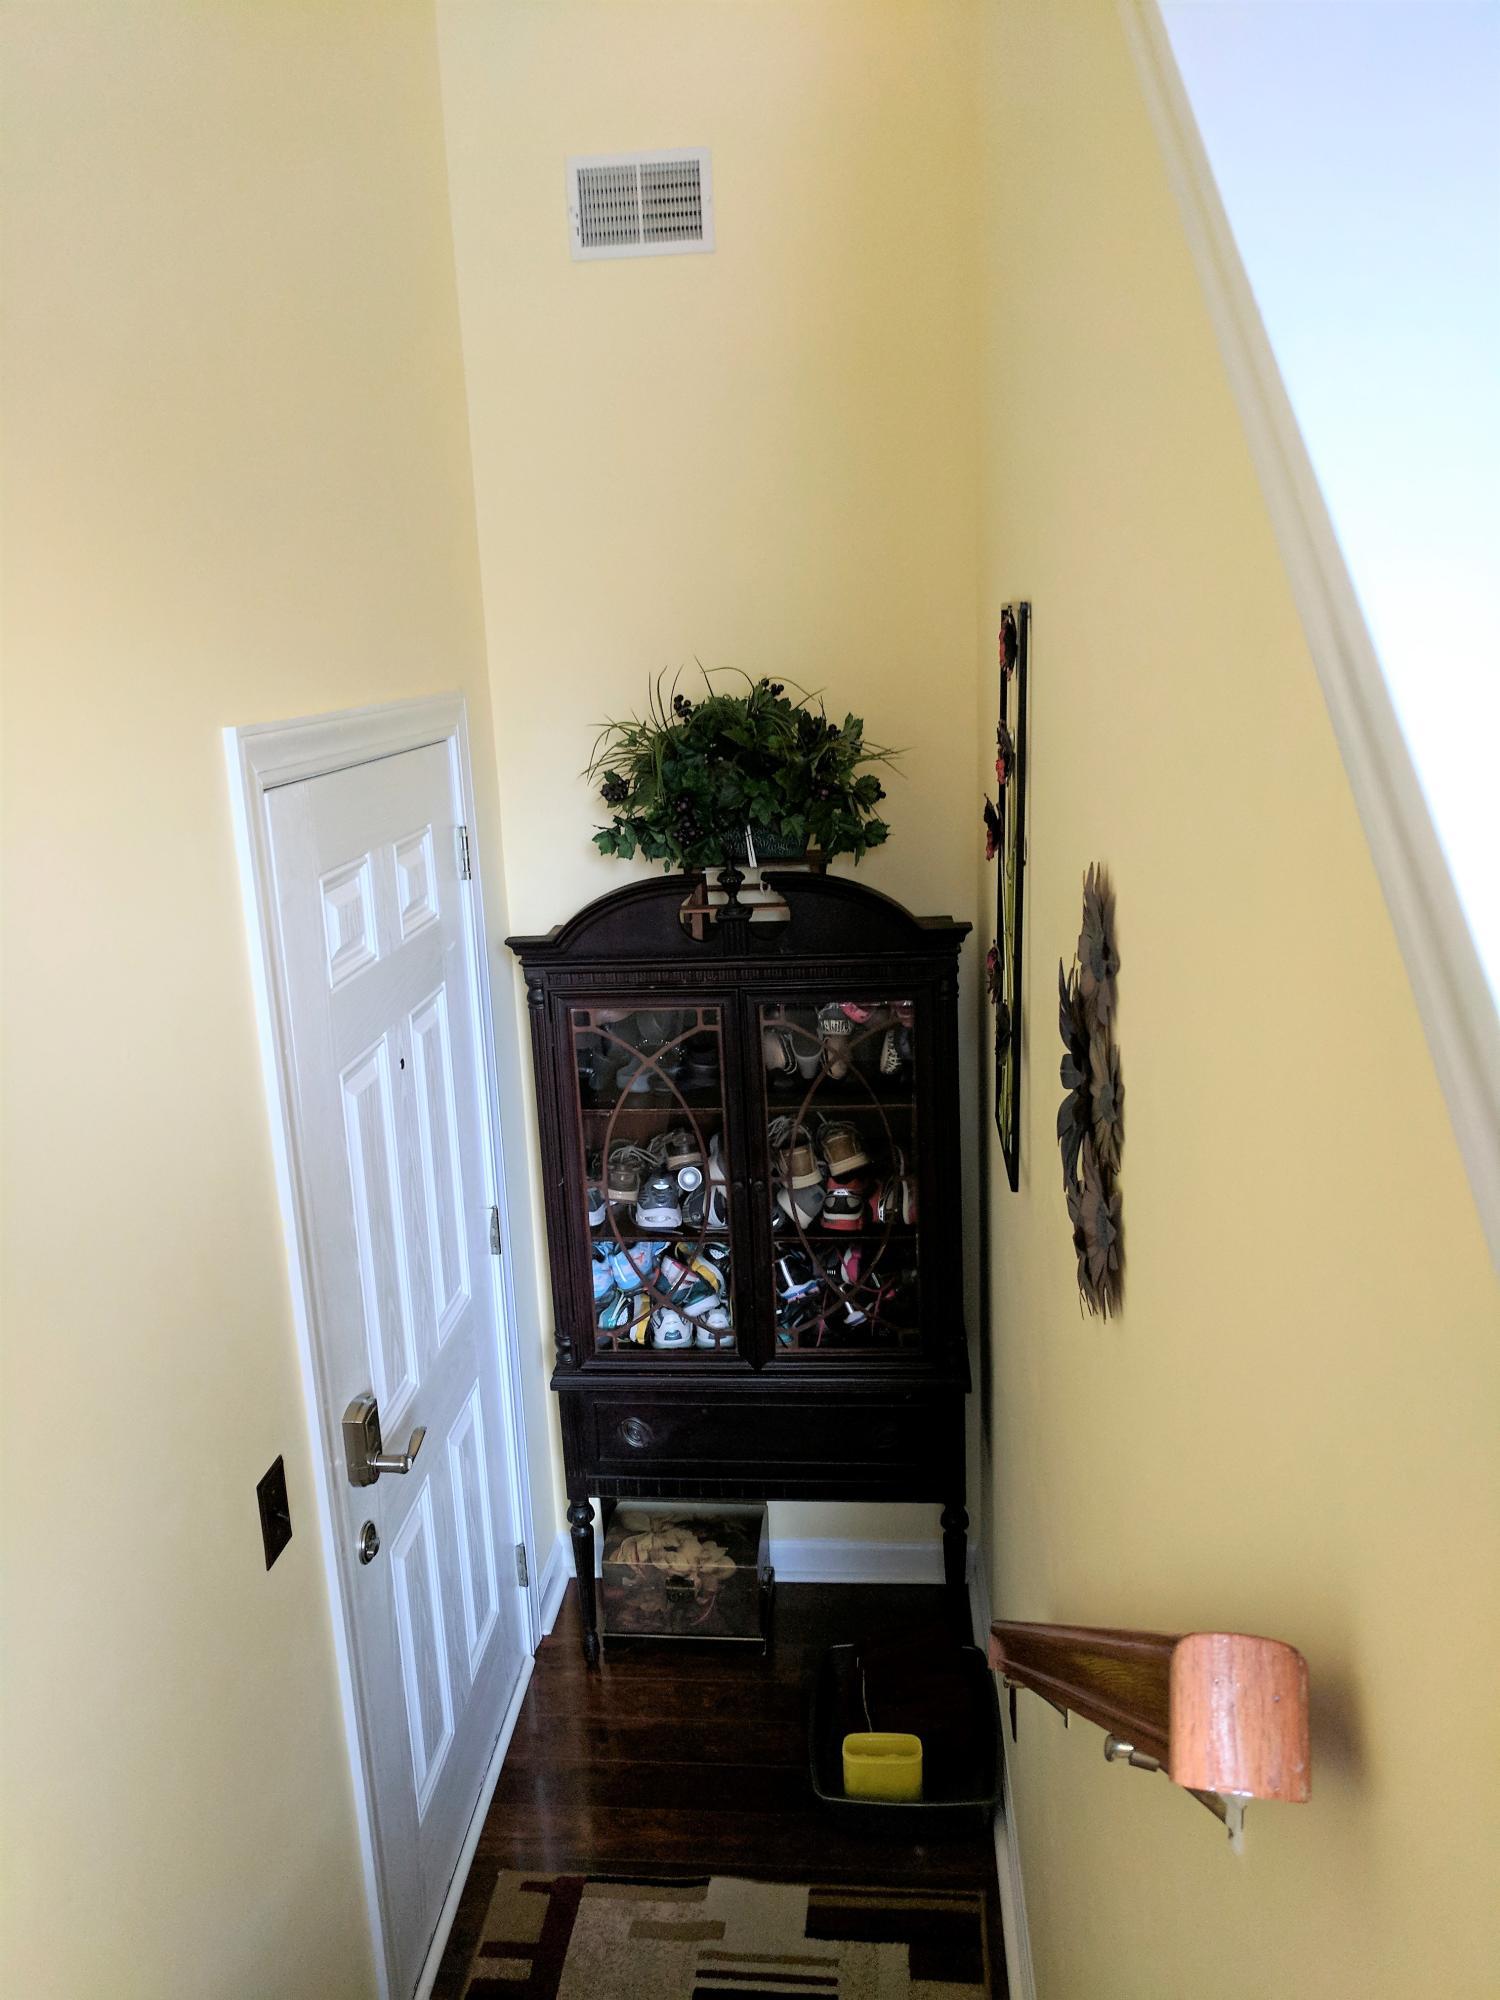 Dunes West Homes For Sale - 1362 Kingsford, Mount Pleasant, SC - 4